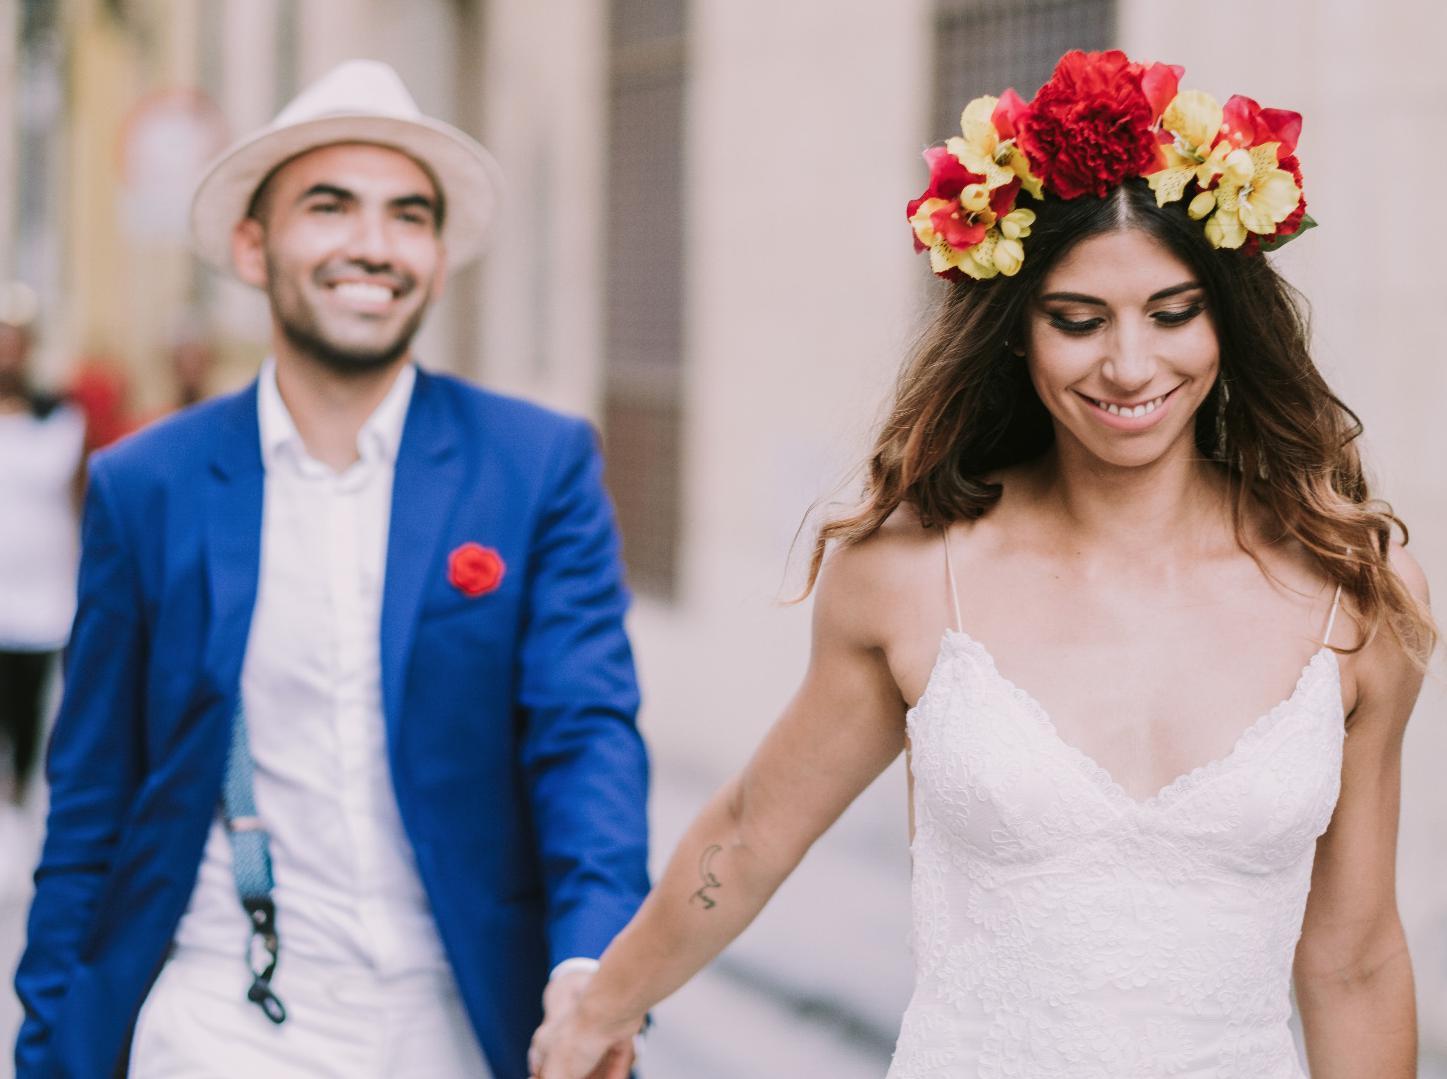 bodas-sin-clasificar-sin-tema-cuba-28882.jpg